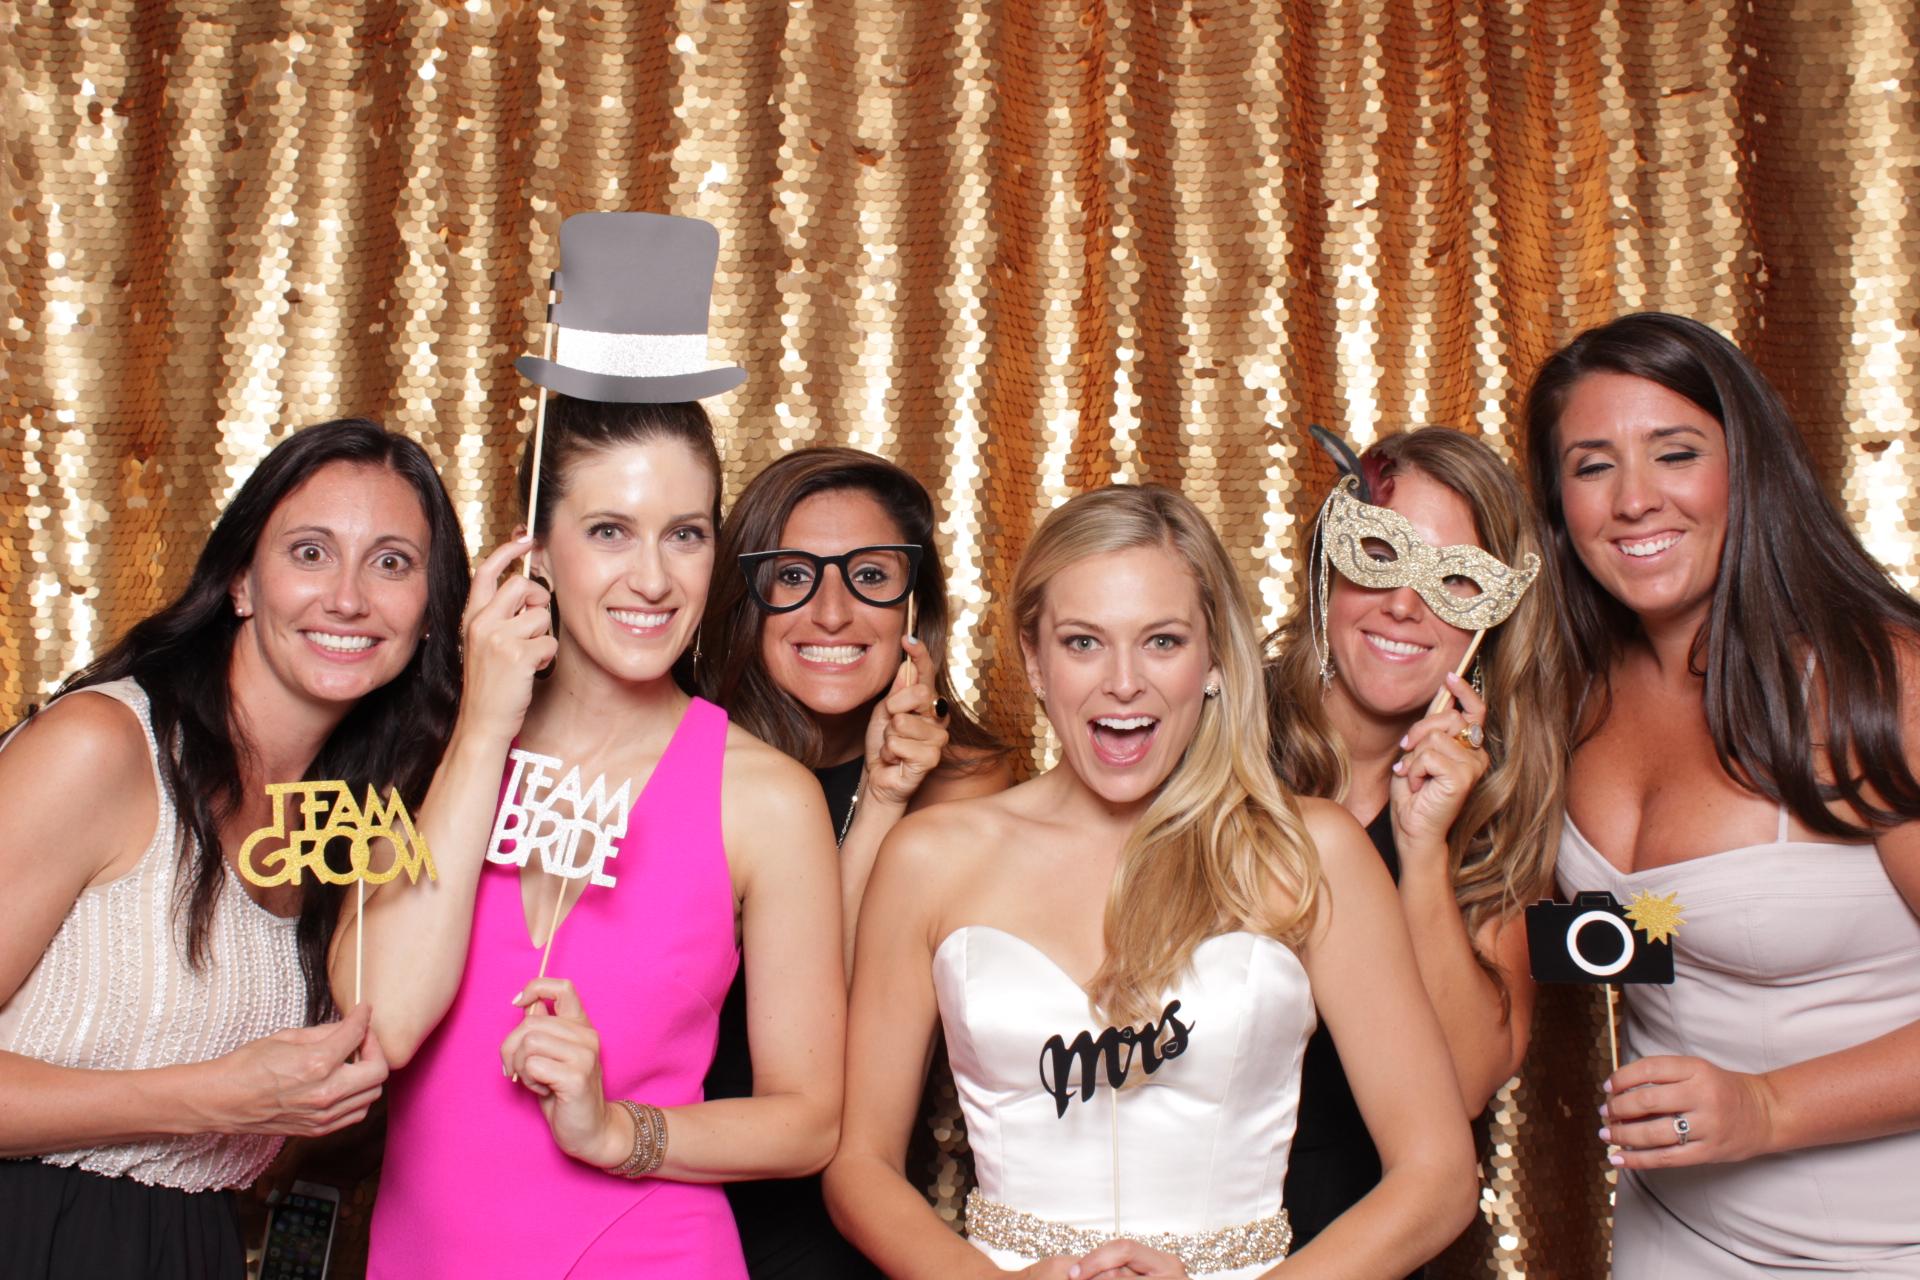 Minneapolis_wedding_photo_booth_Machine_Shop.jpg